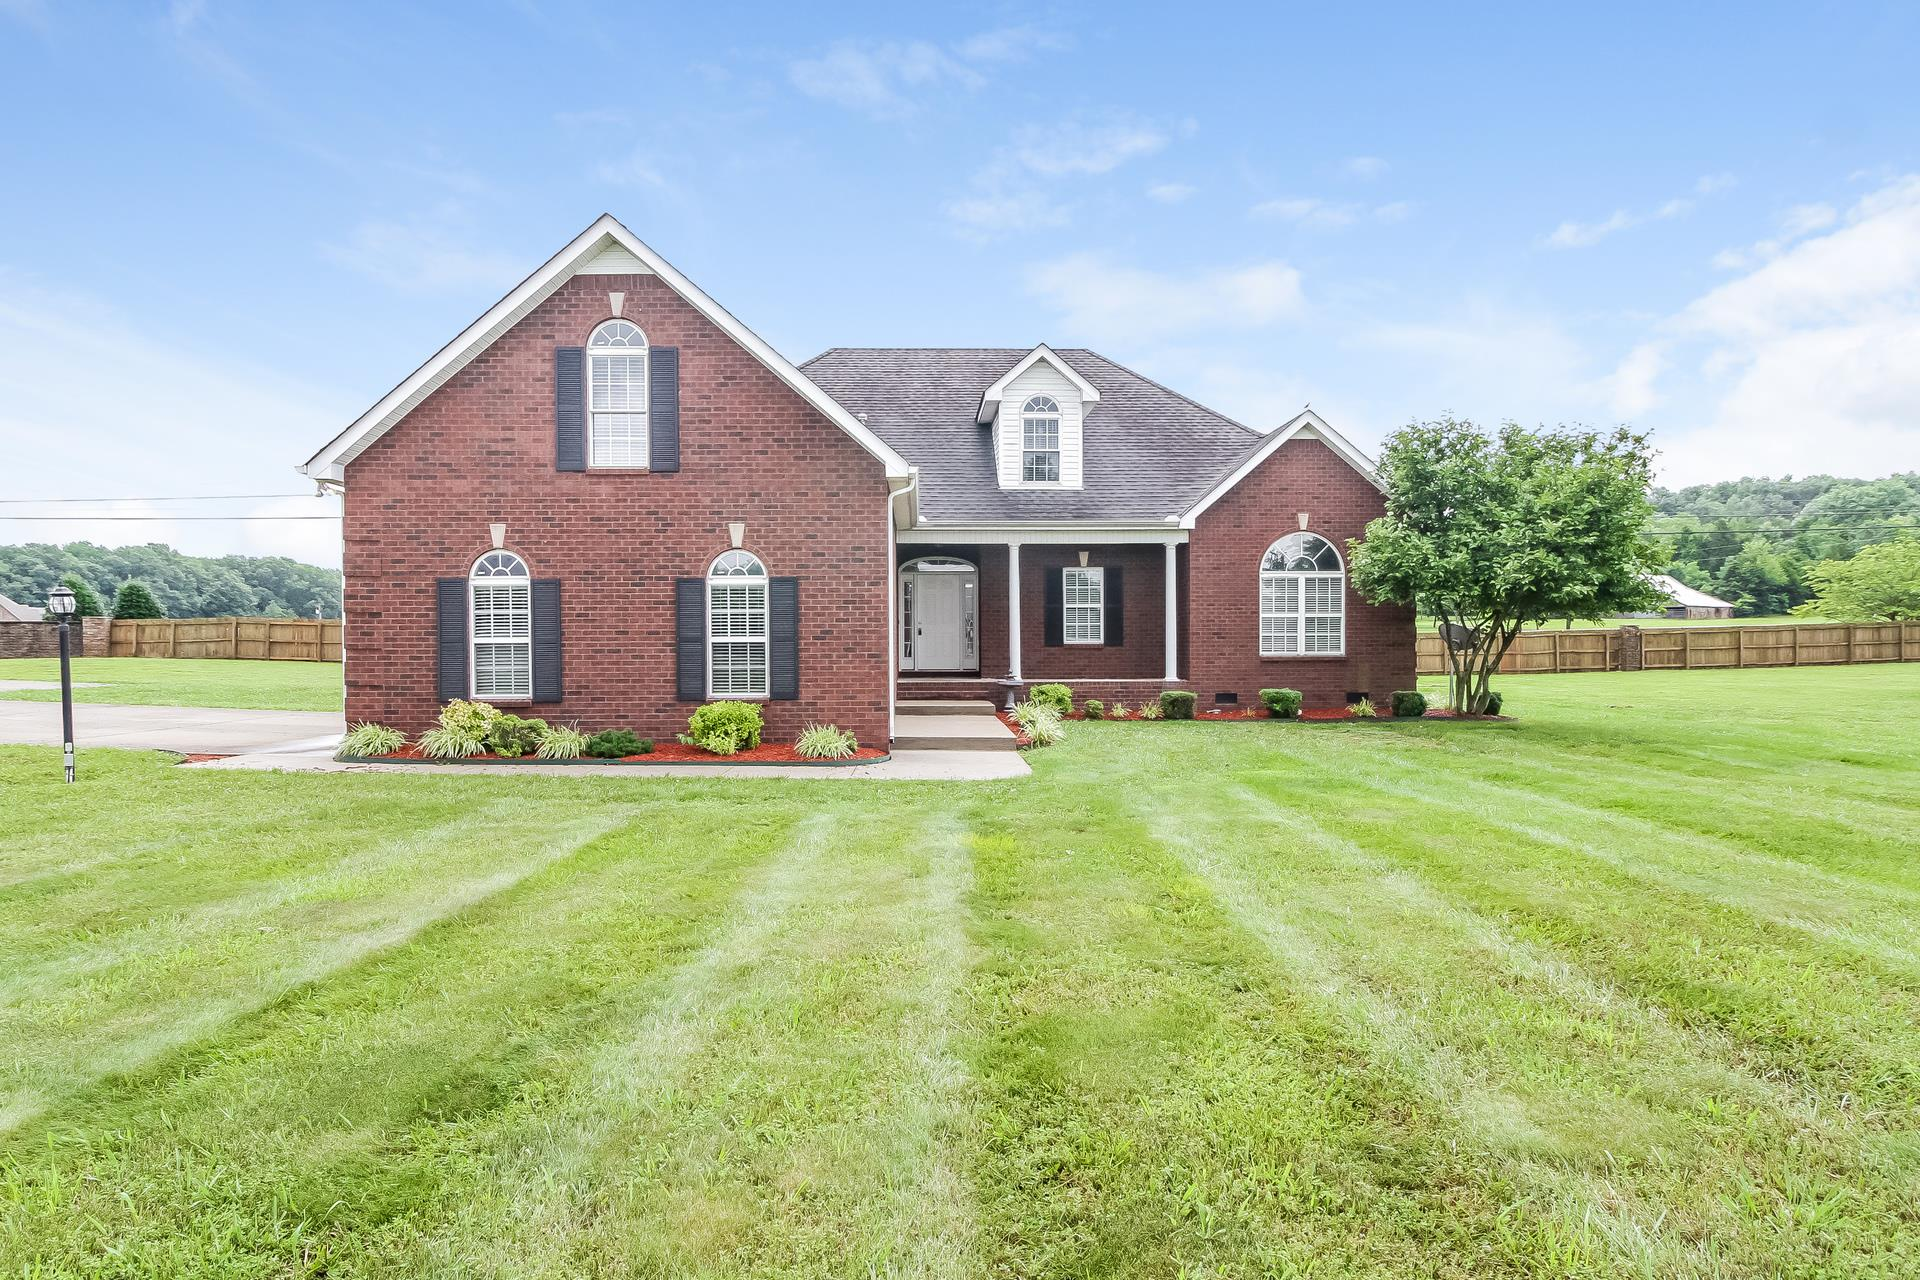 1005 John Hood Dr, Rockvale, TN 37153 - Rockvale, TN real estate listing